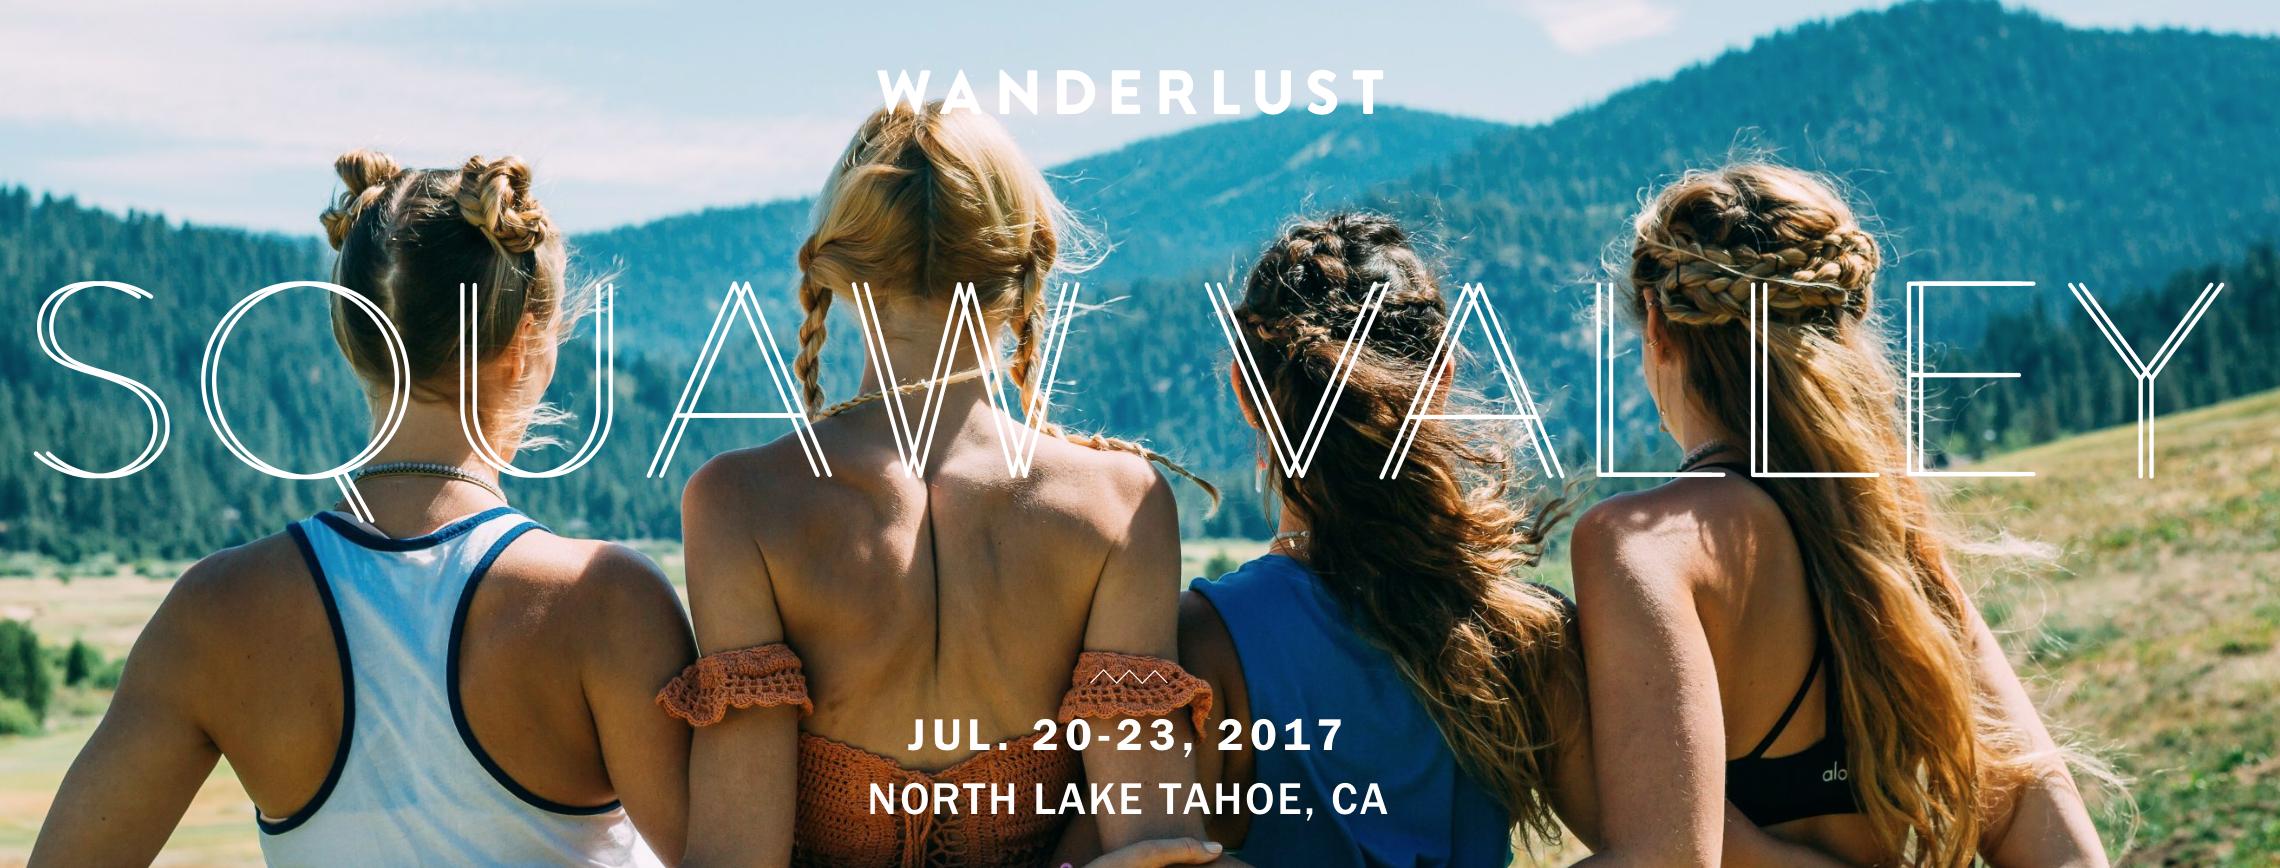 Wanderlust Squaw Valley Festival